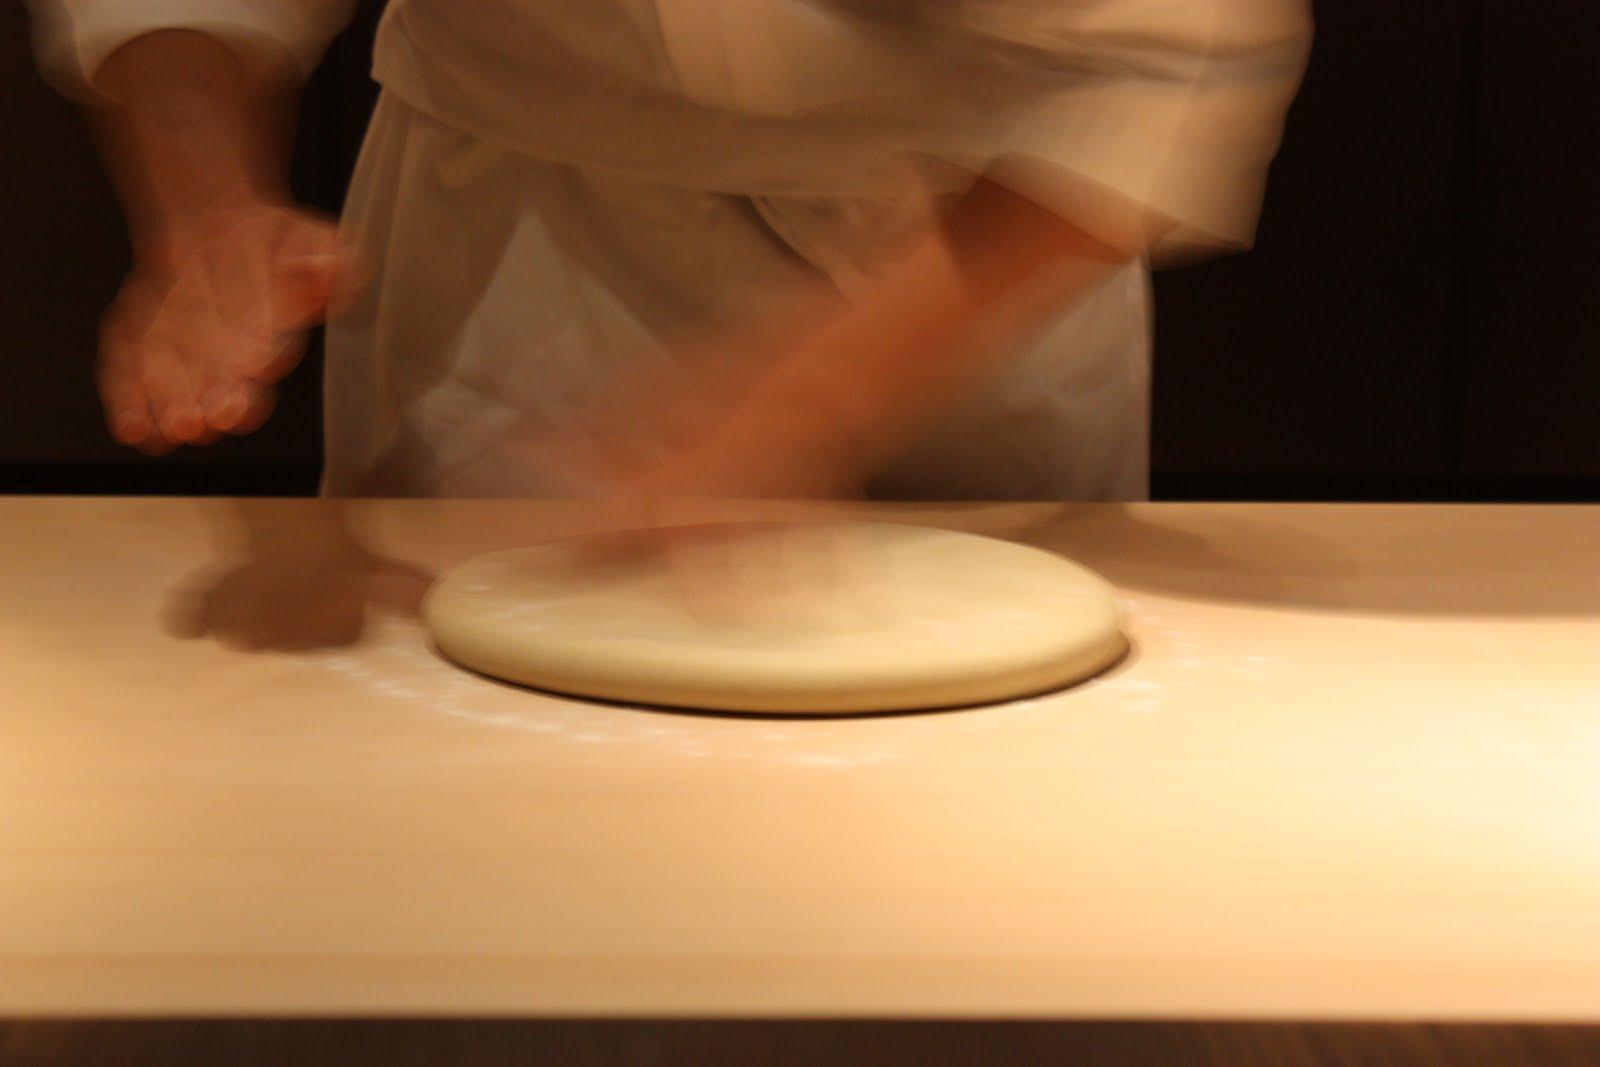 http://4.bp.blogspot.com/_O8giQlzAuF8/S8JLVuI1-yI/AAAAAAAAAc4/nplKSQAVz5k/s1600/121709_Kyoto_Soba_Making+(c)+Deanna+Ting.JPG